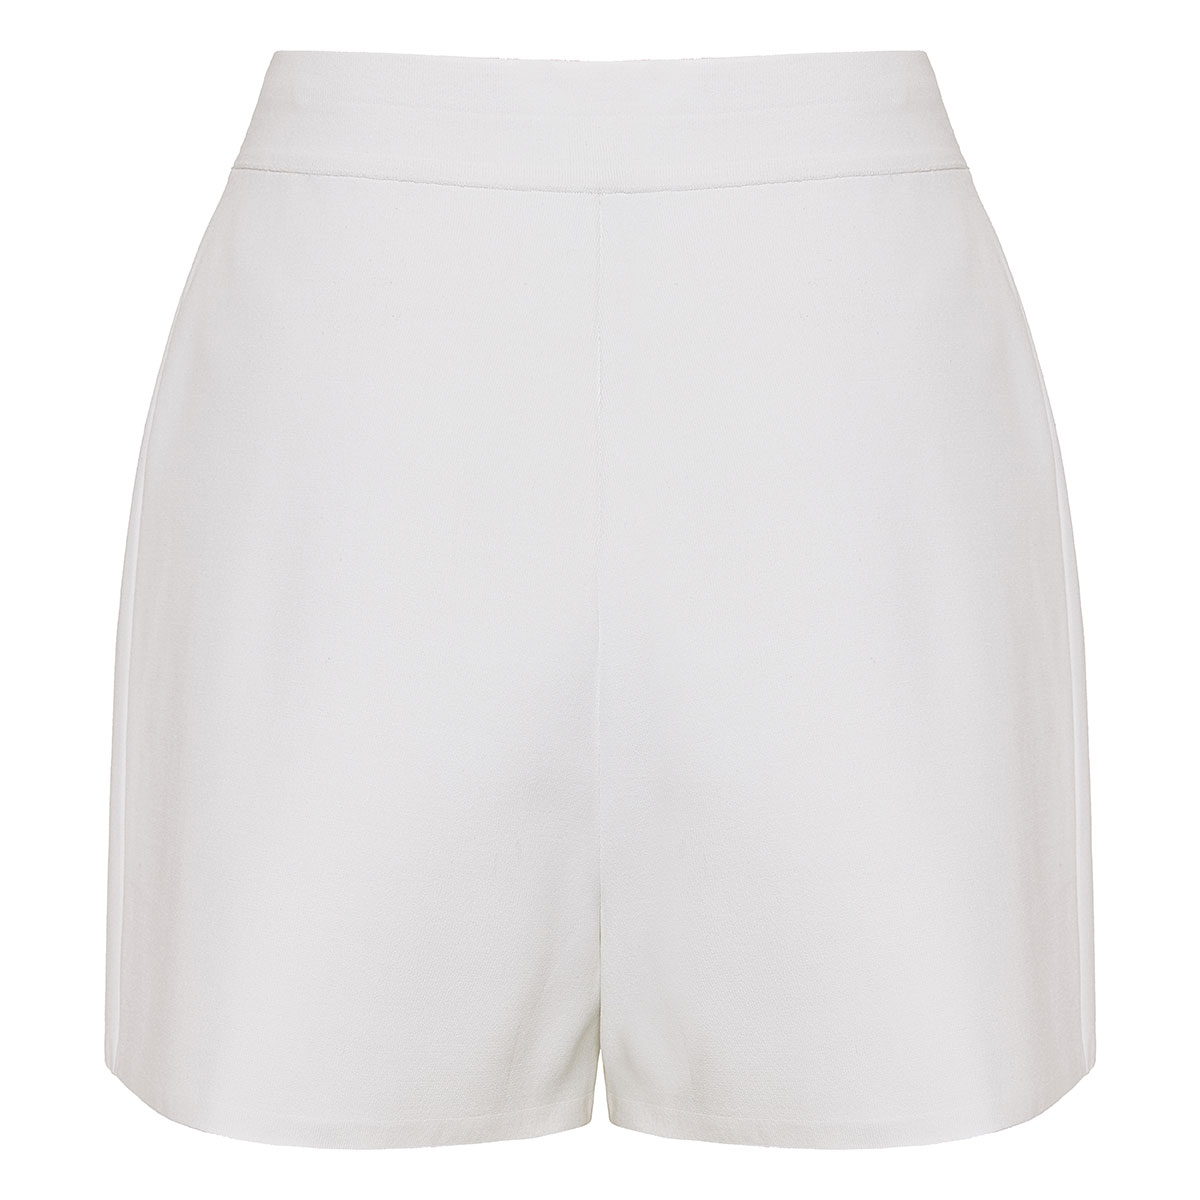 High-waist darted shorts